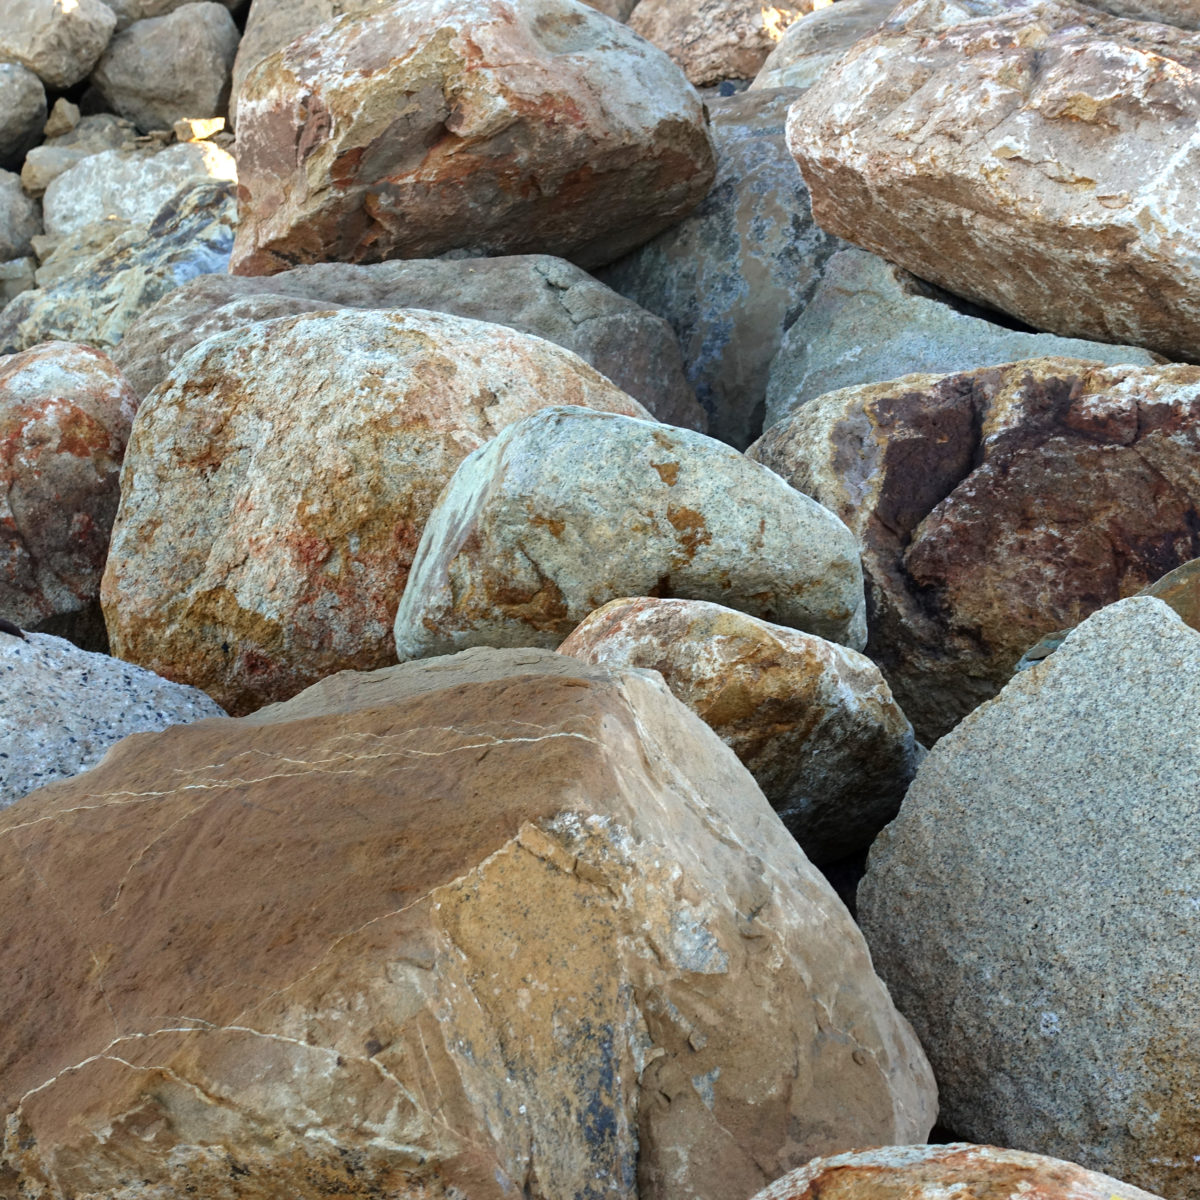 Group of brown ale landscape boulders in rock yard